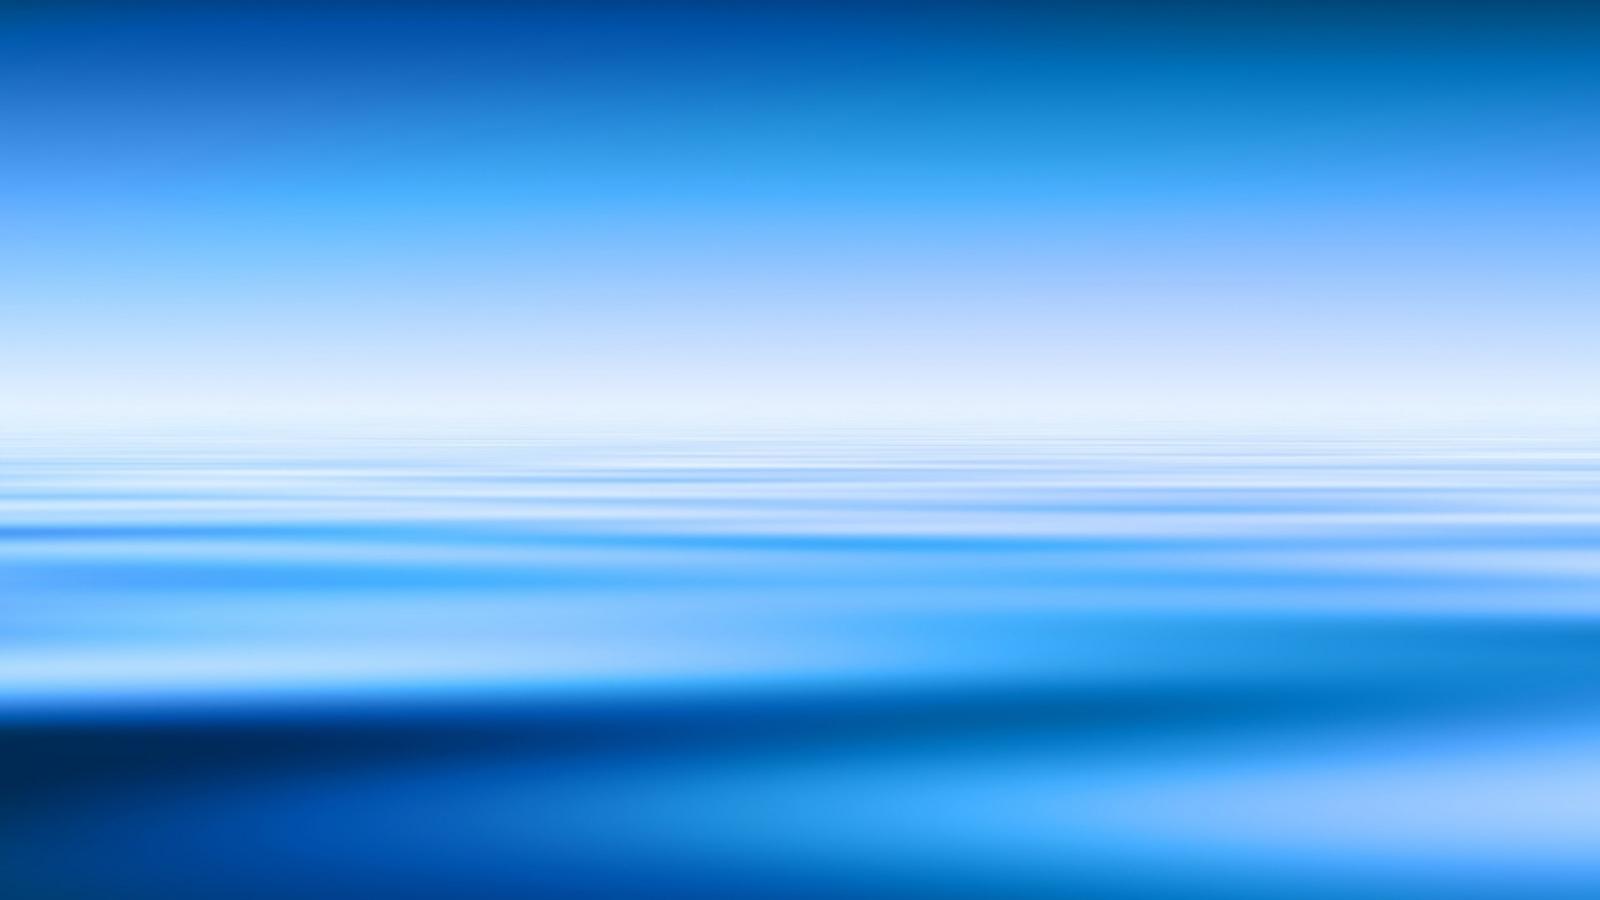 water surface wallpaper - photo #10